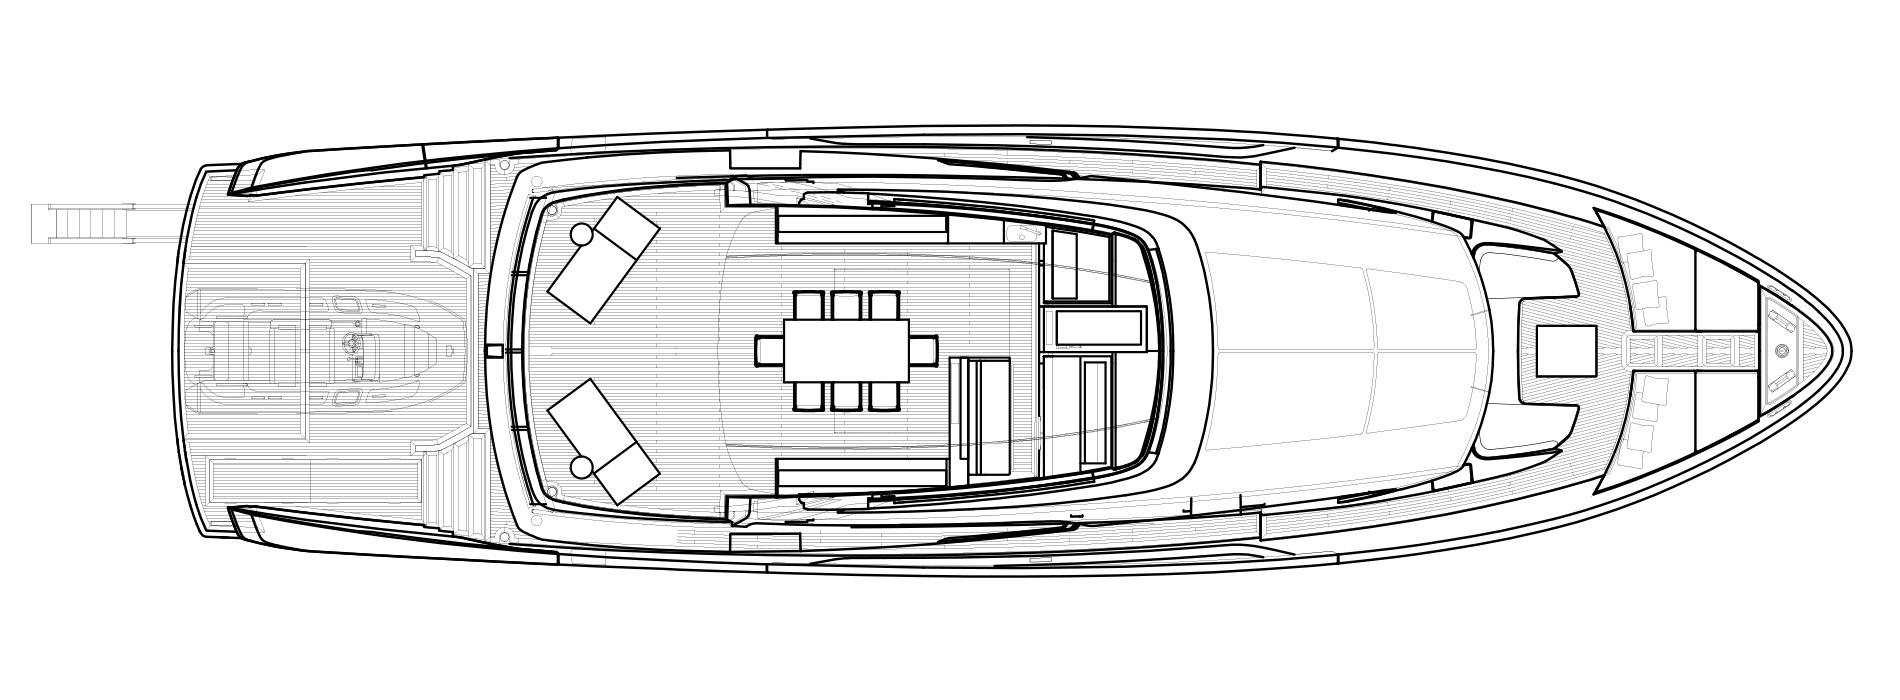 Sanlorenzo Yachts SX88 Flying bridge Versione Lissoni